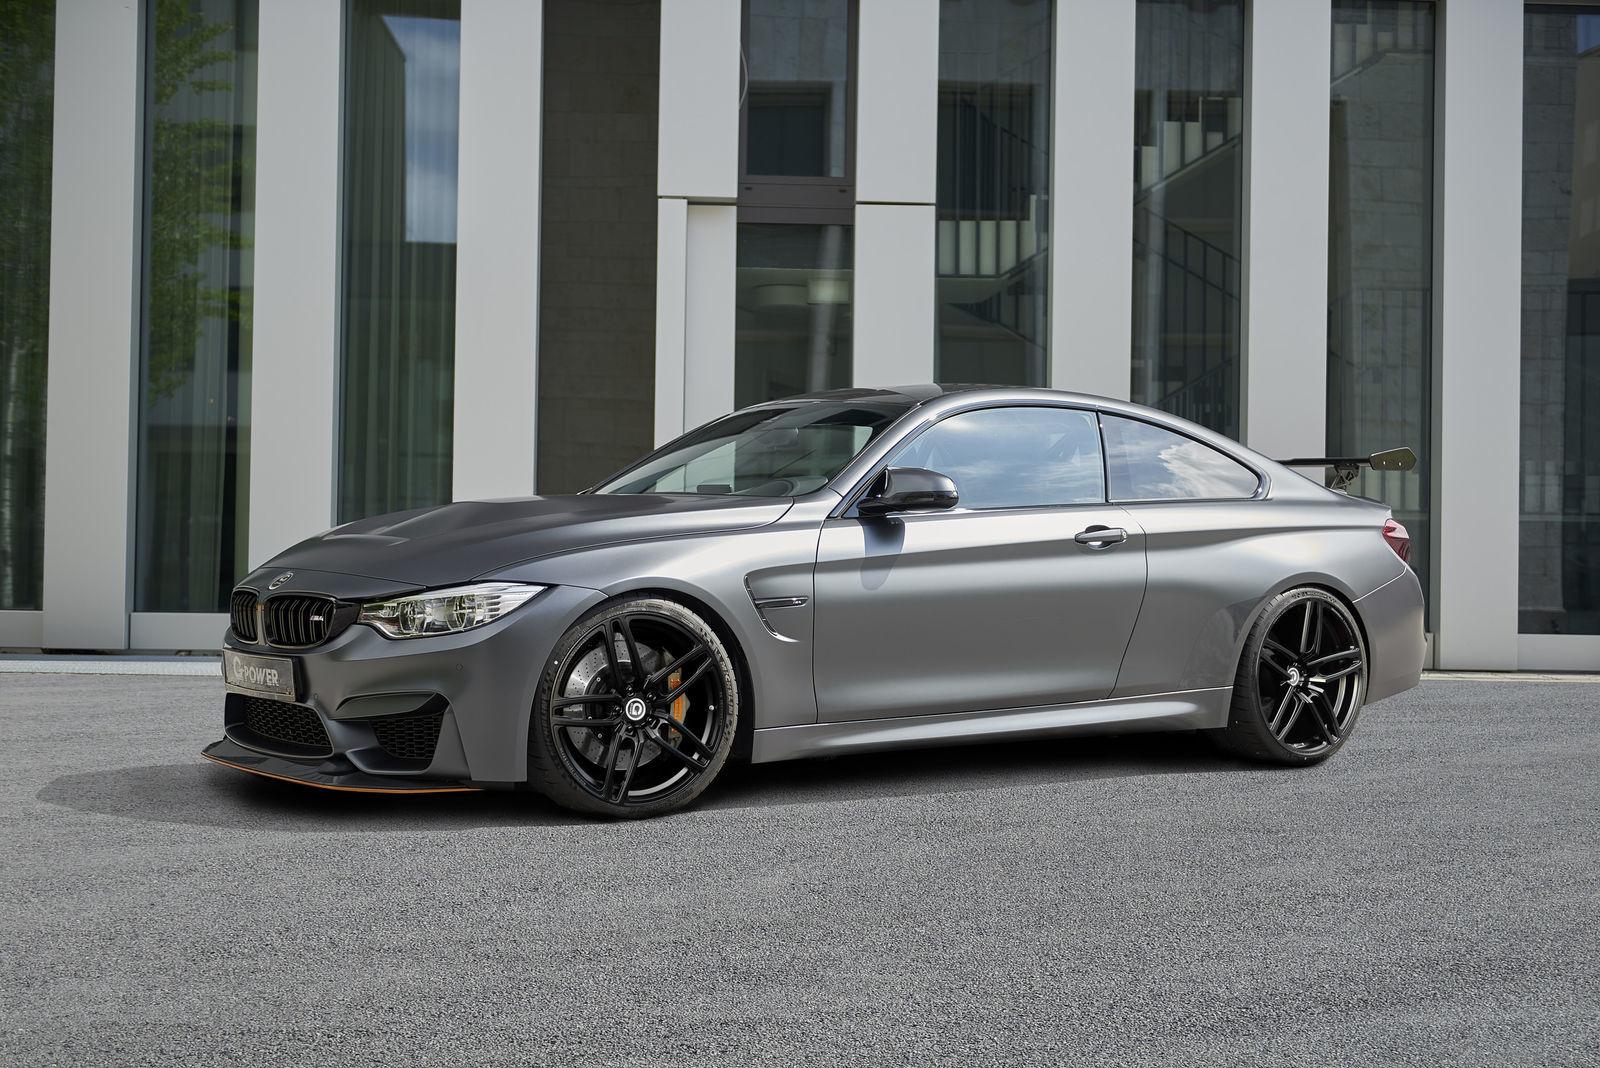 Foto de G-Power BMW M4 GTS (2/5)